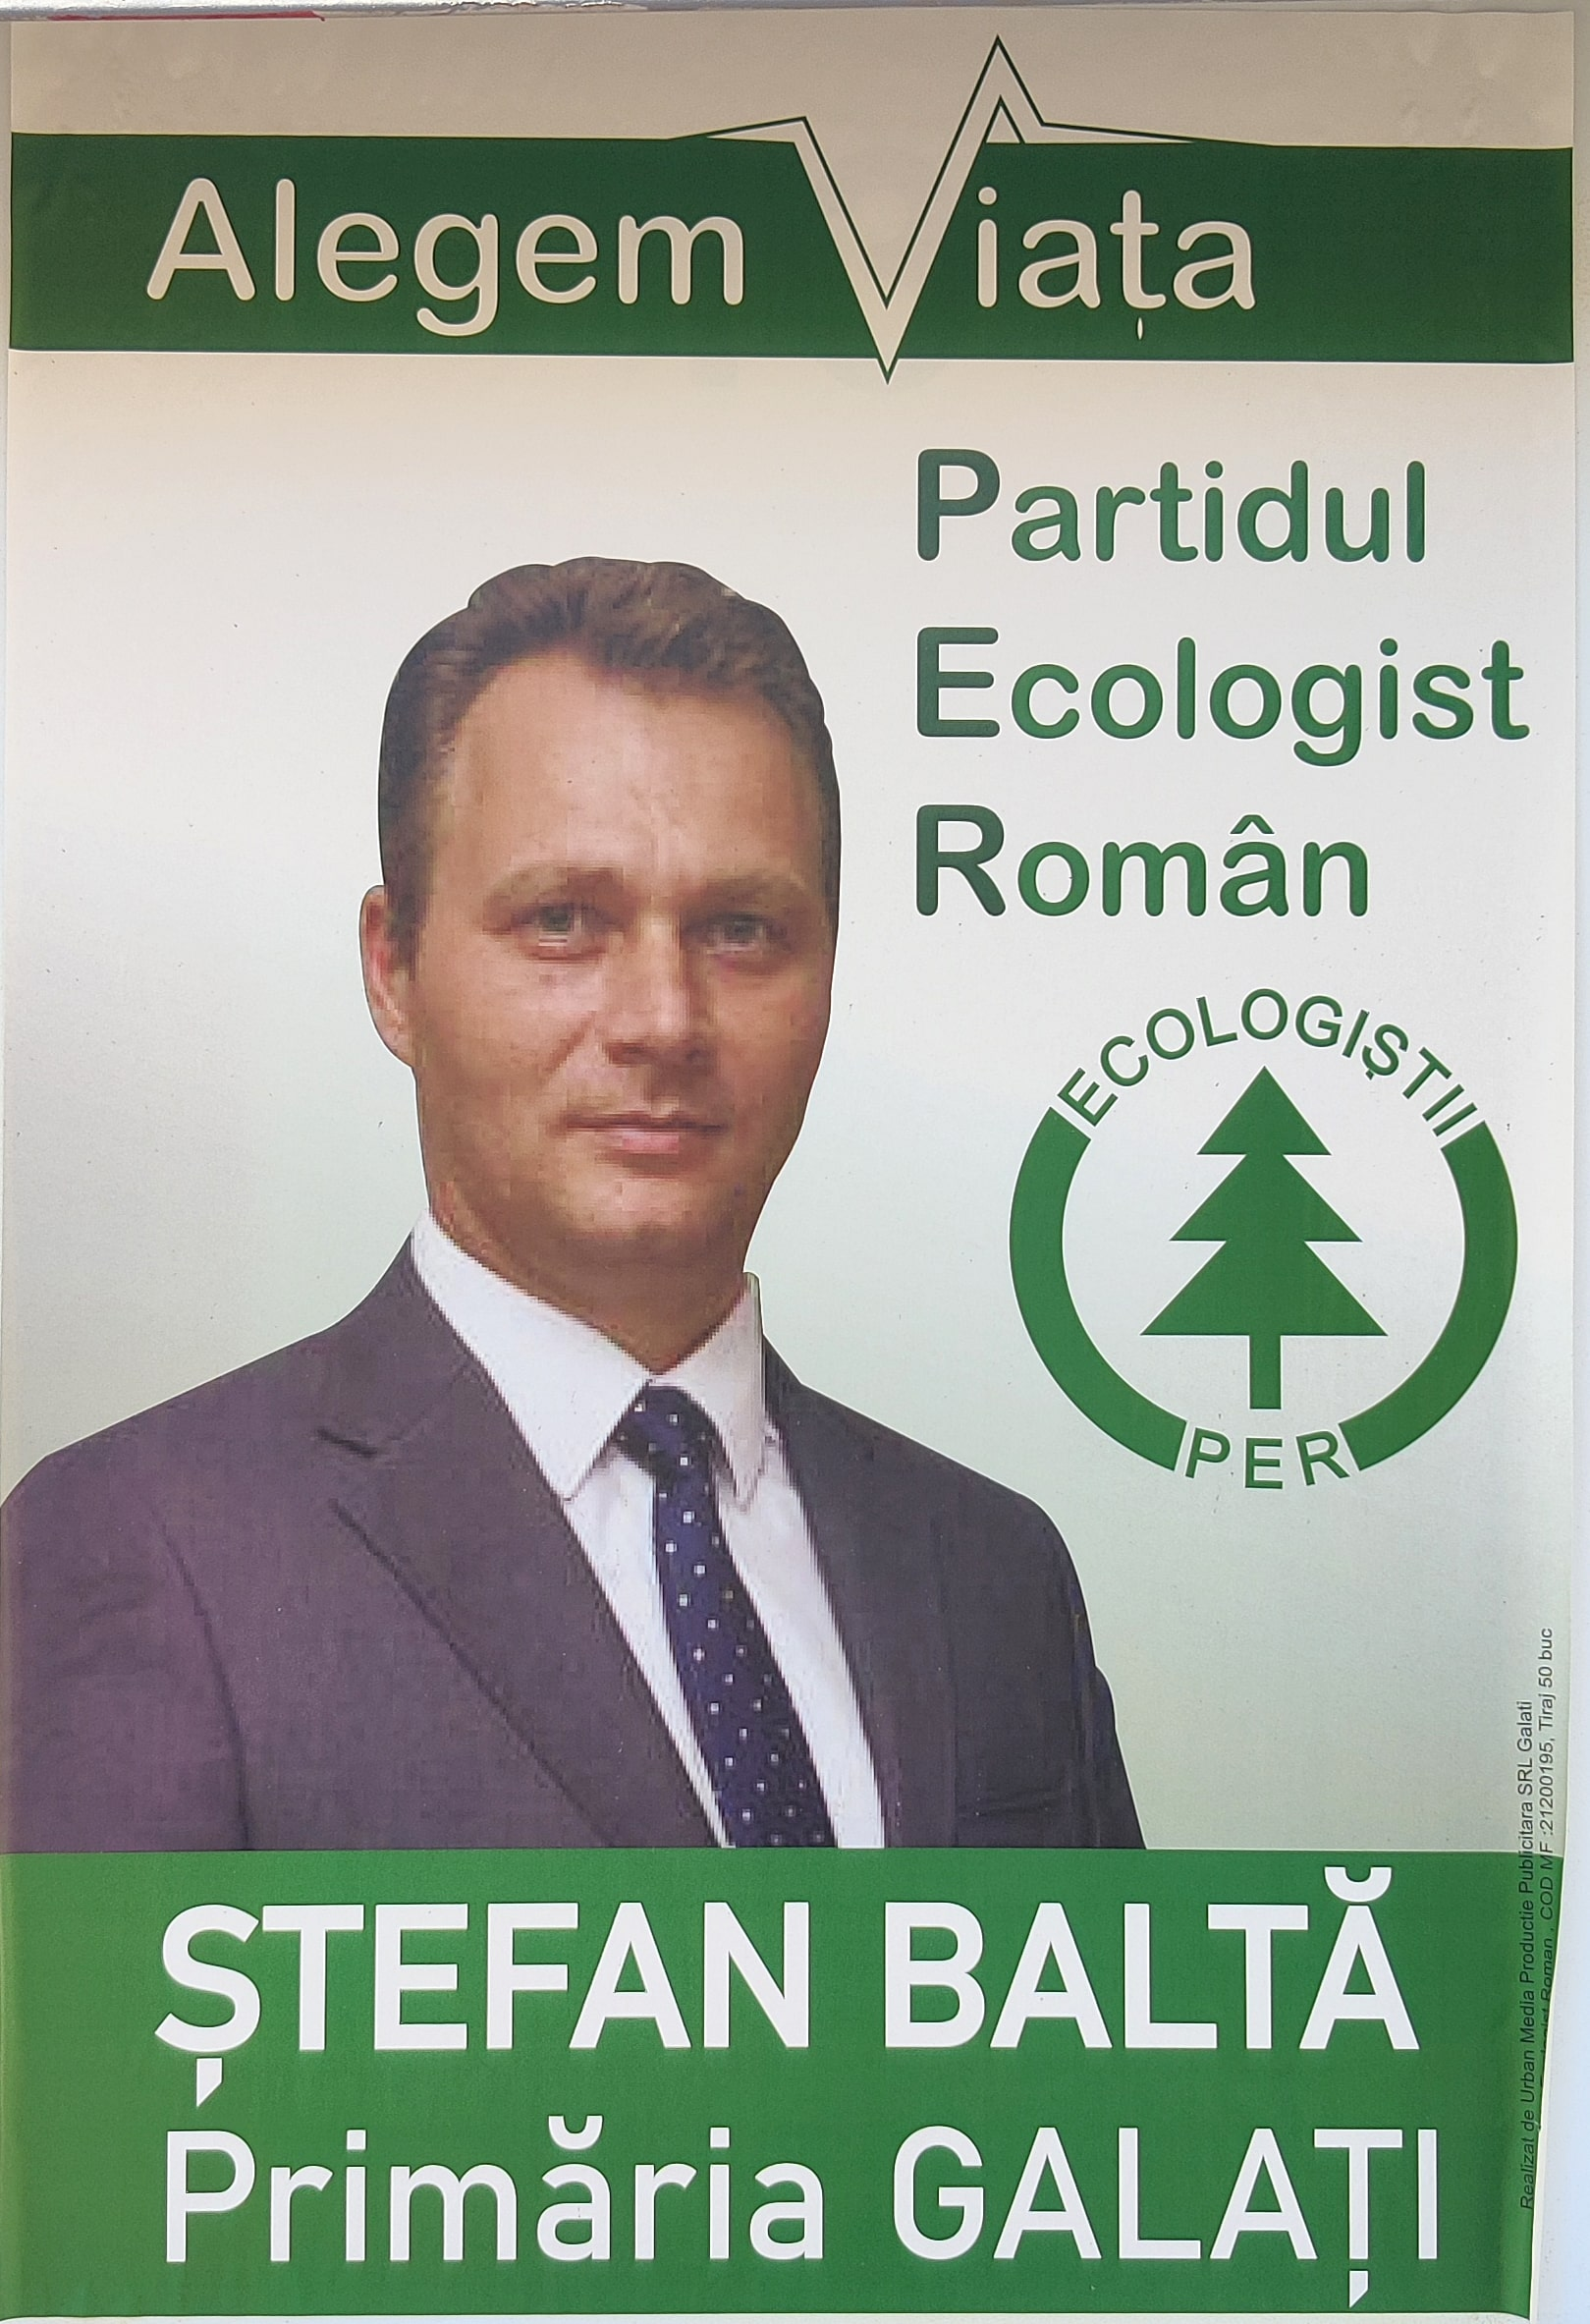 Ștefan Baltă - PER - Candidat Primărie